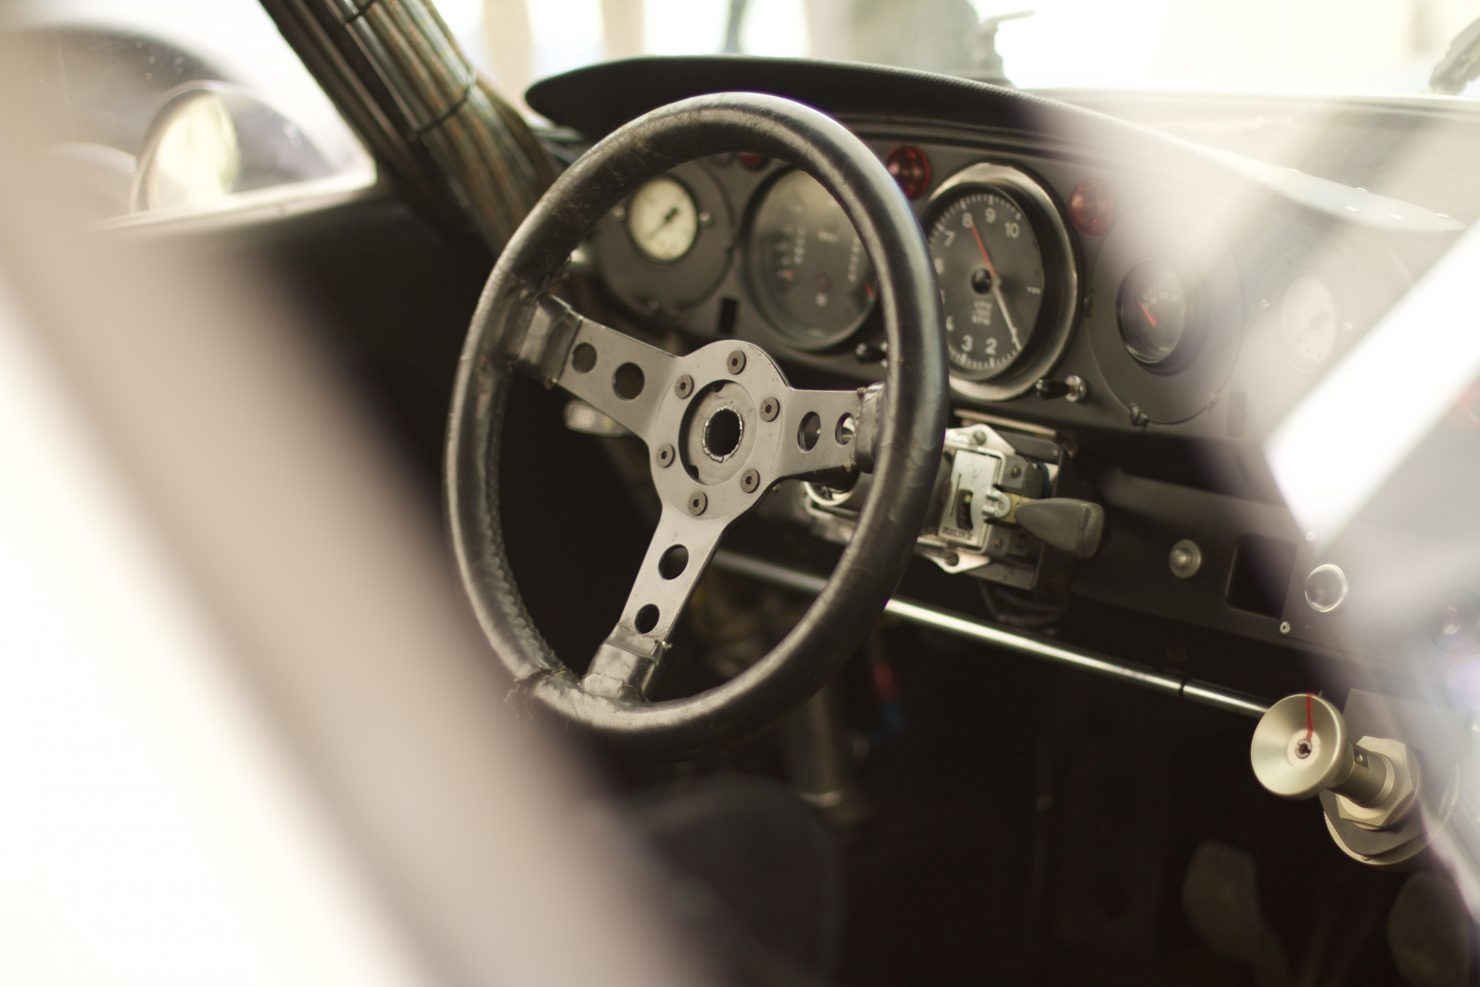 1973 Porsche 911 RSR Turbo 2.1 1480x987 - Cockpits of Goodwood